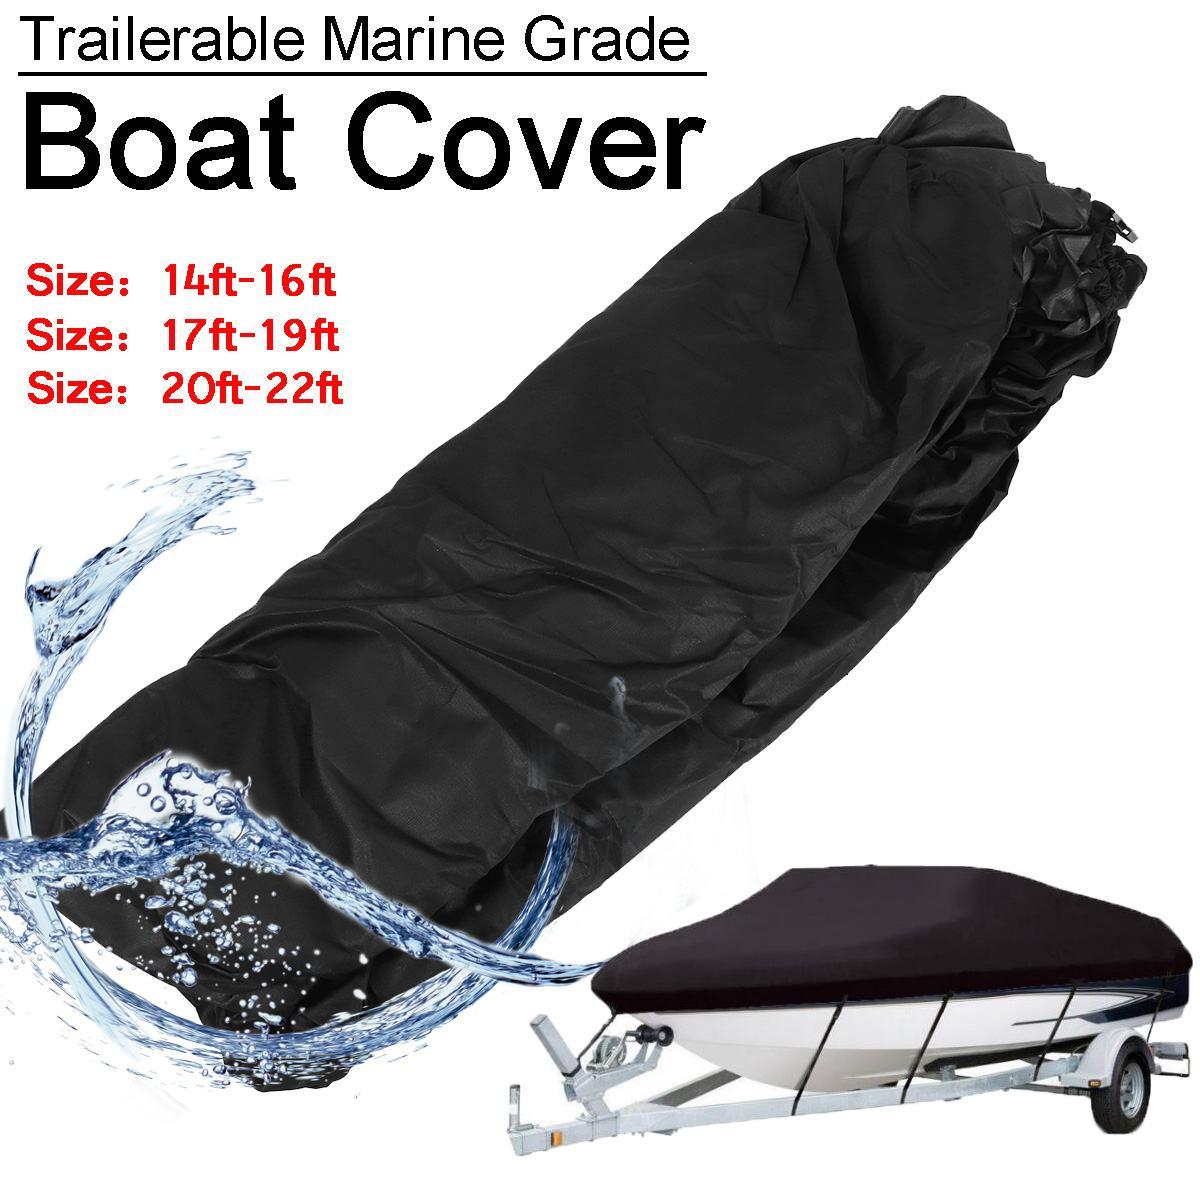 600D Heavy Duty Trailerable Tampa Do Barco Navio Barco À Prova D Água Anti-UV Toldo Pesca Lanchas Barco de Esqui Capa Acessório